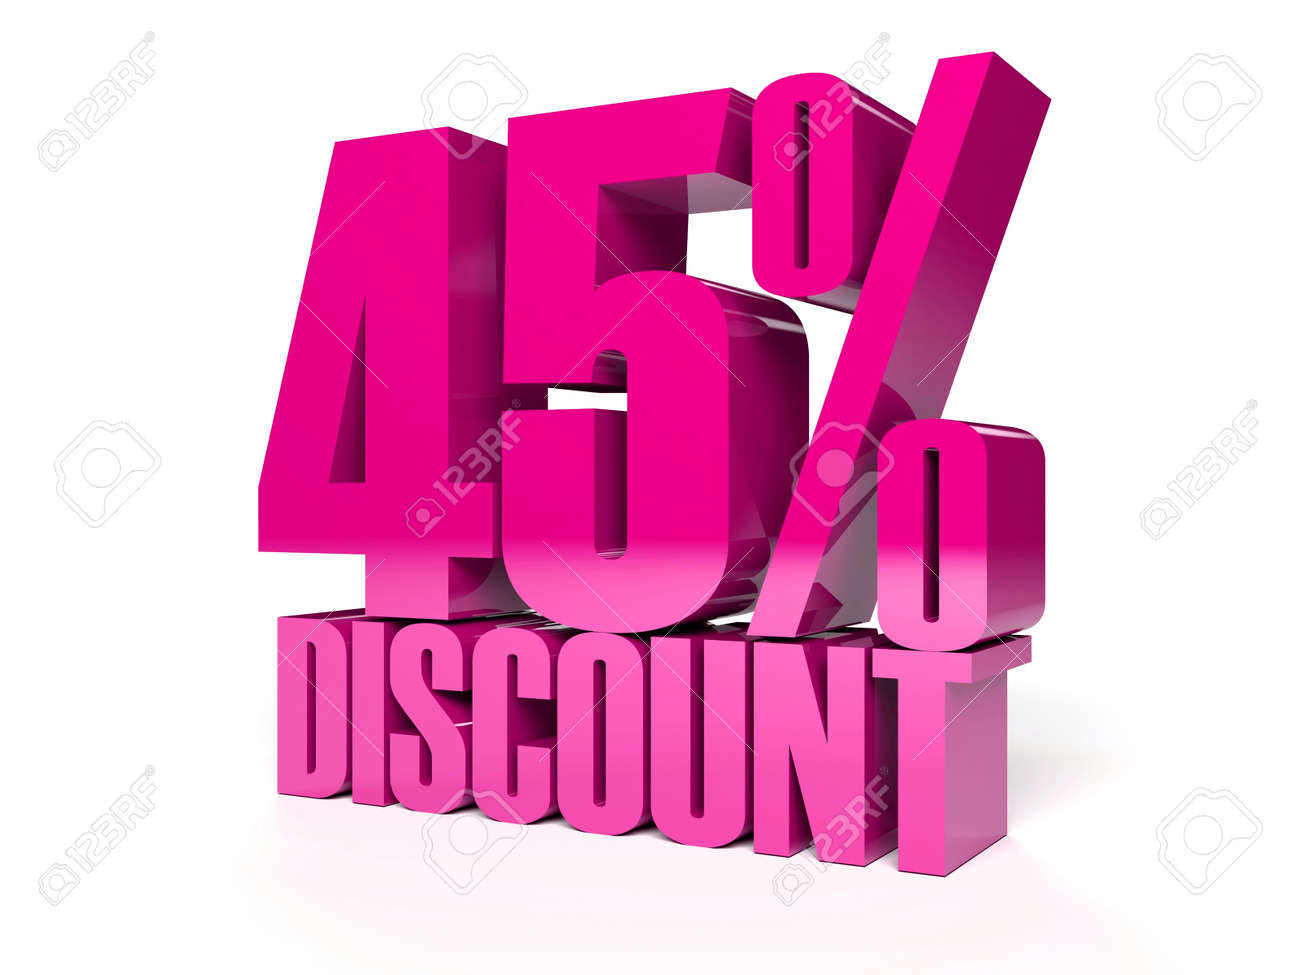 45 percent discount. Pink shiny text. Concept 3D illustration. Stock Illustration - 22491877